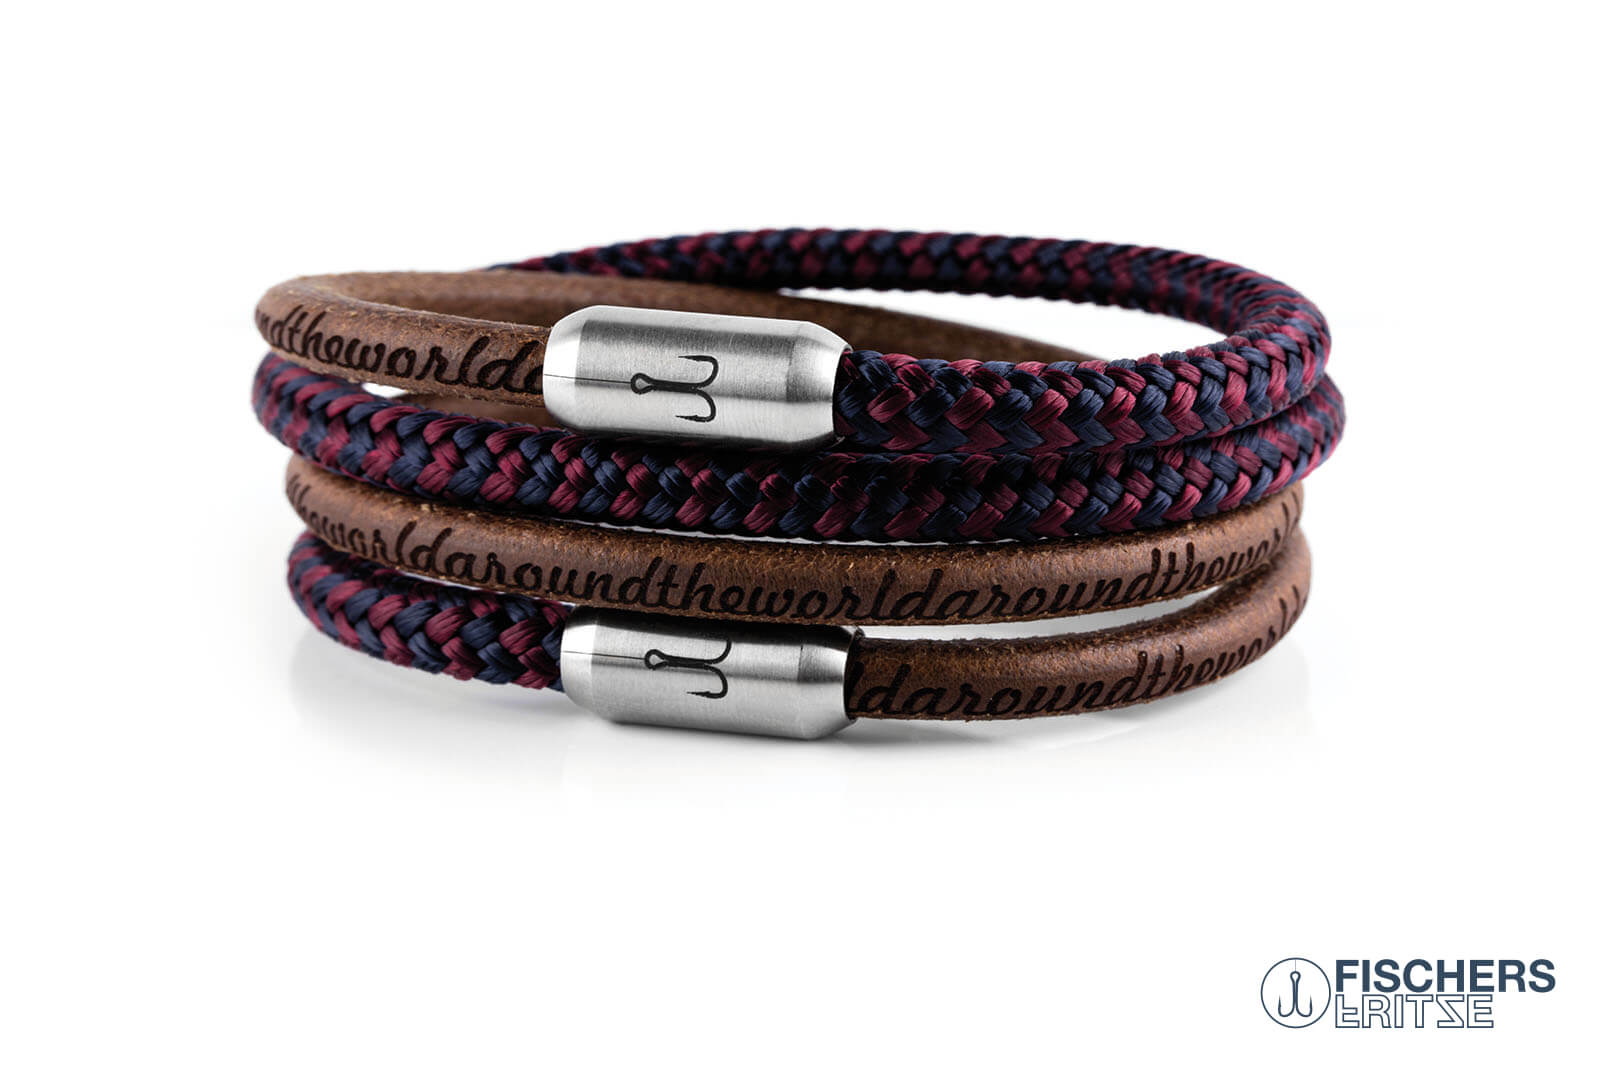 armband-fischers-fritze-kombigarnele-natur-gefettet-blau-rot-leder-segeltau